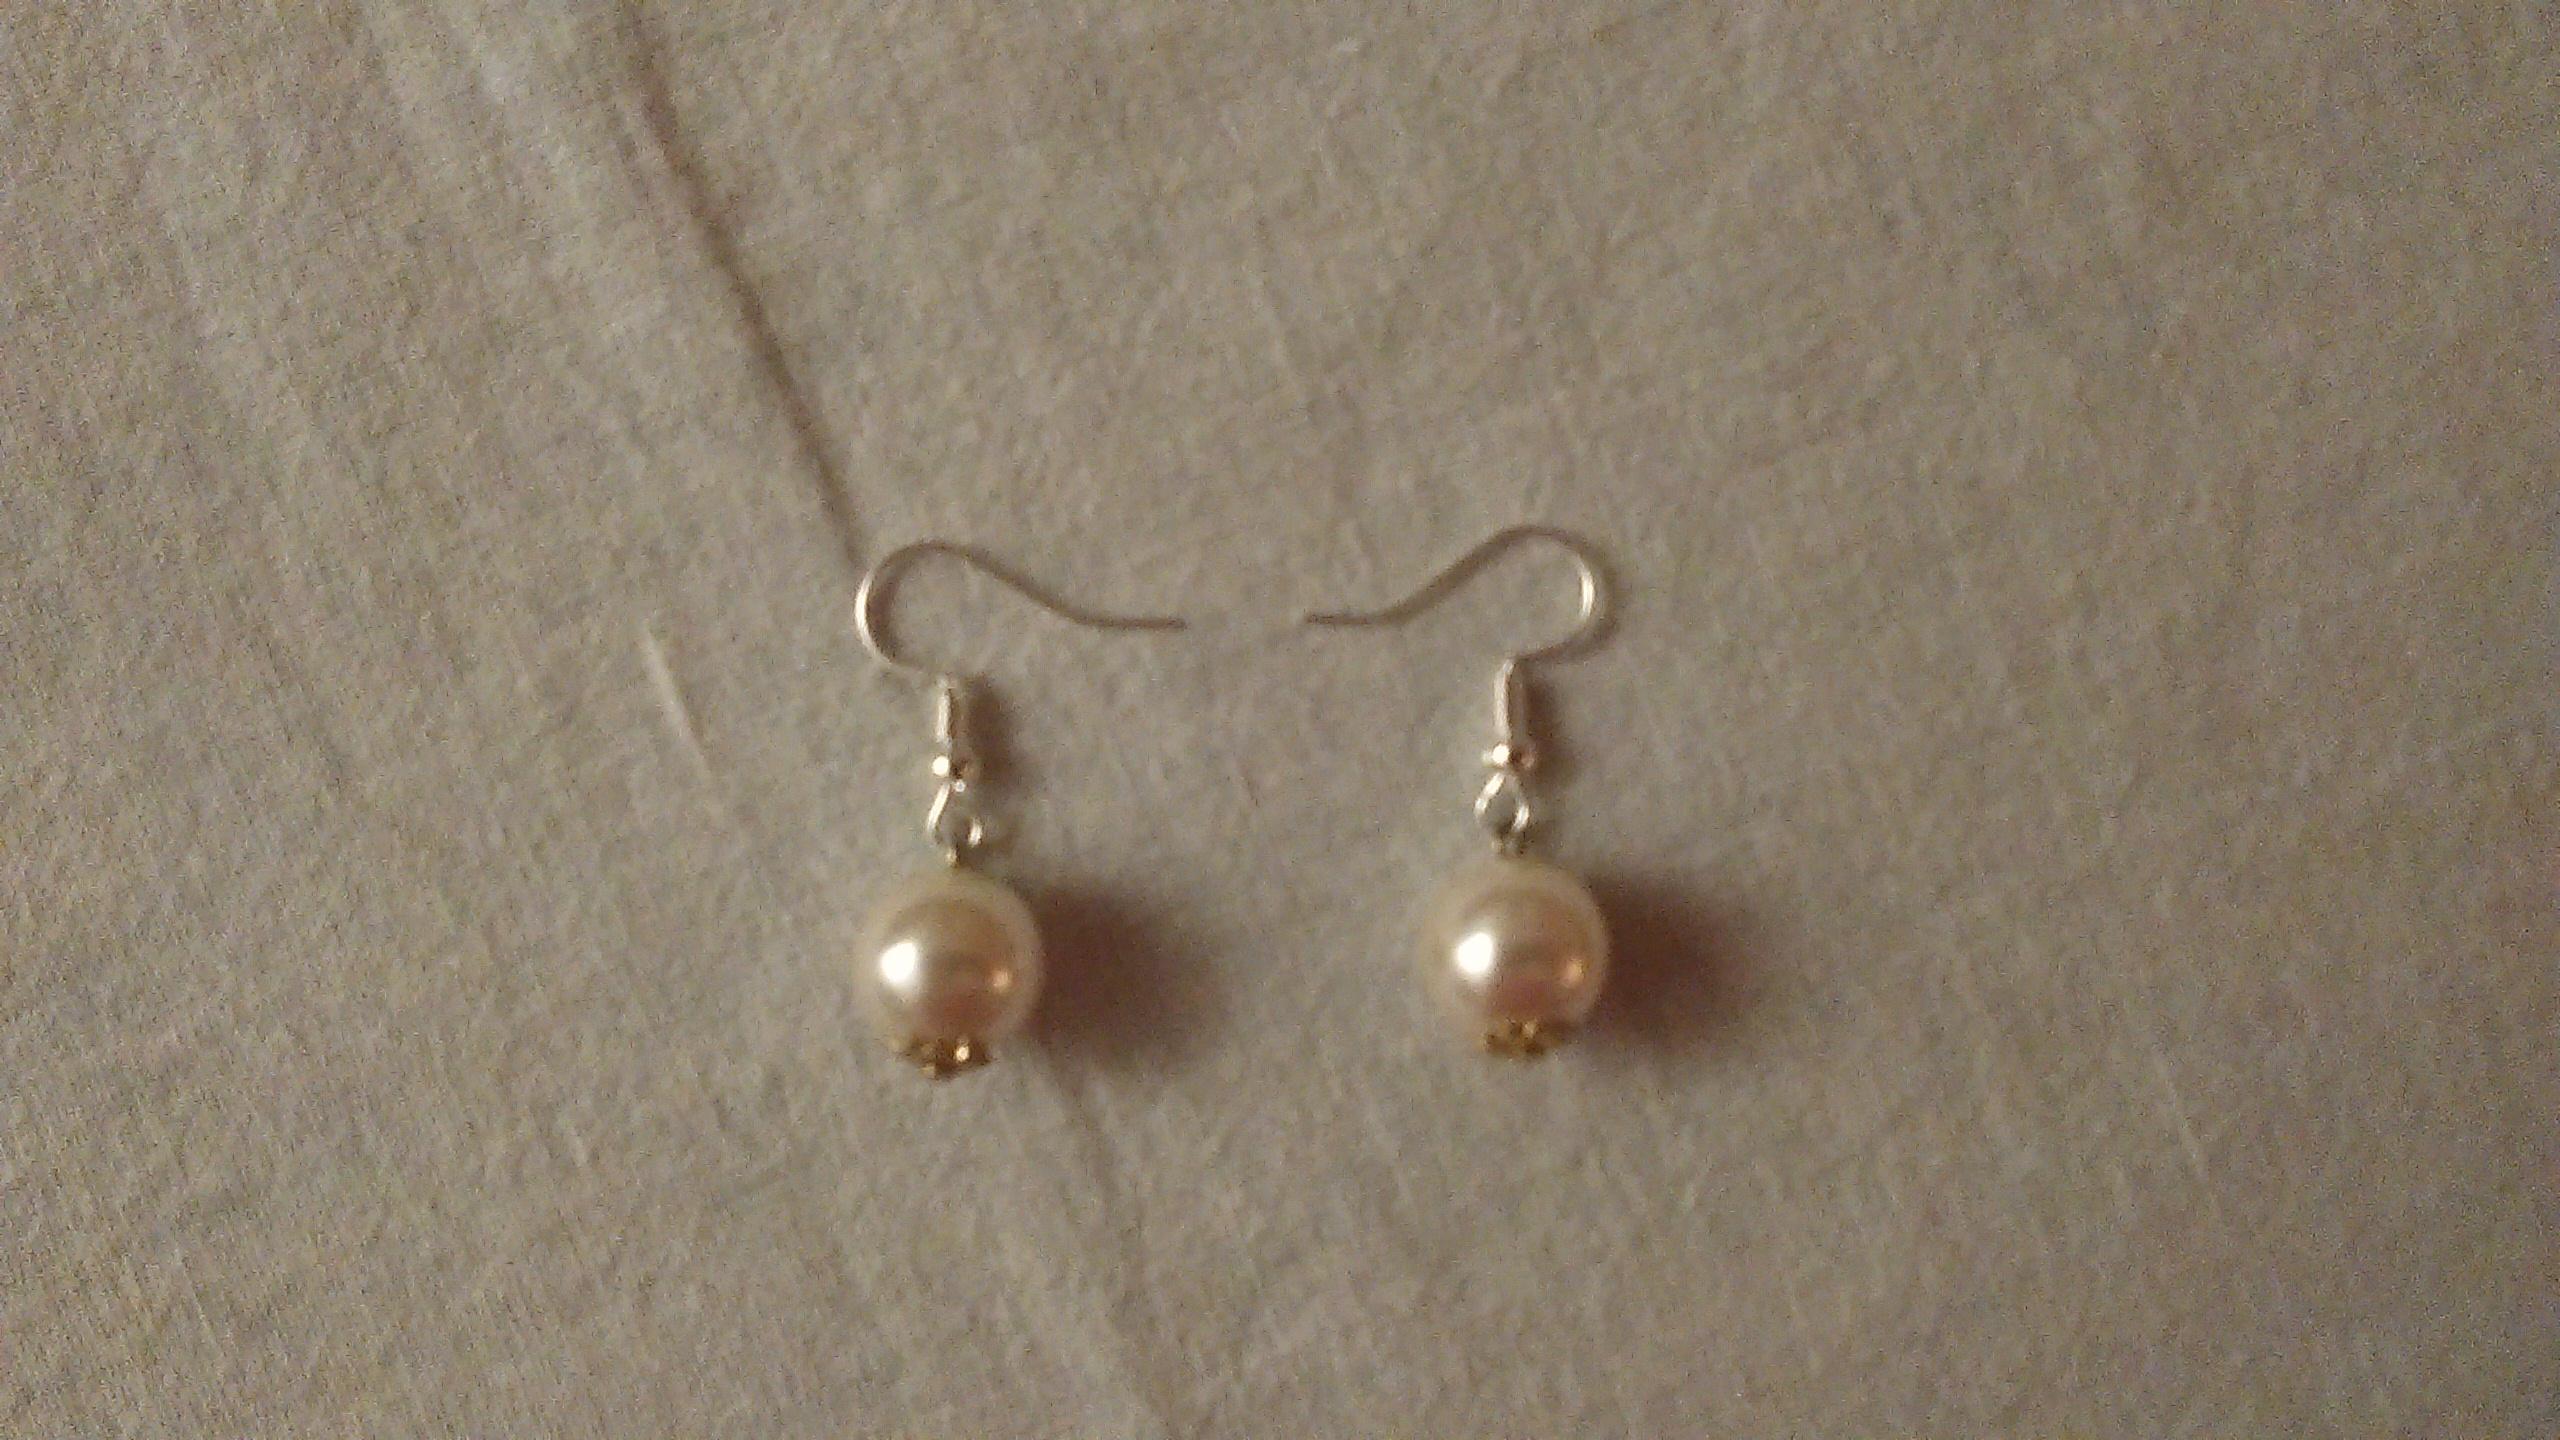 troc de troc b.o. perles blanches. image 0